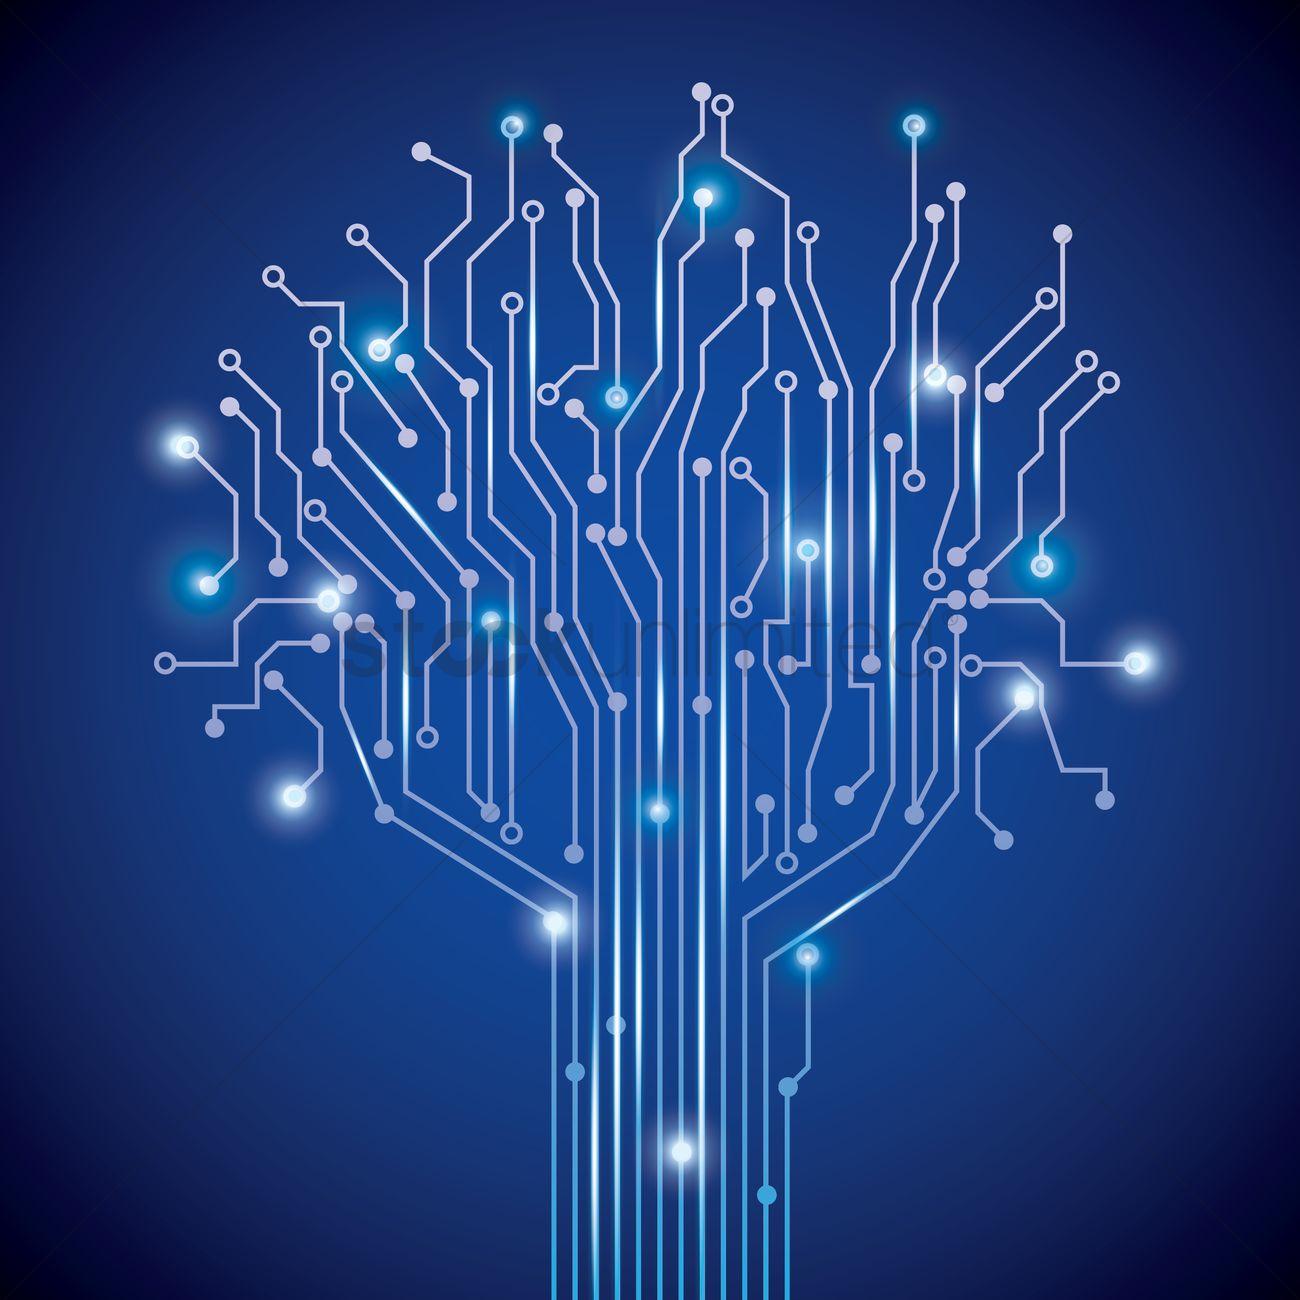 Download Iphone X Live Wallpaper Tree Design On Circuit Board Wallpaper Vector Image